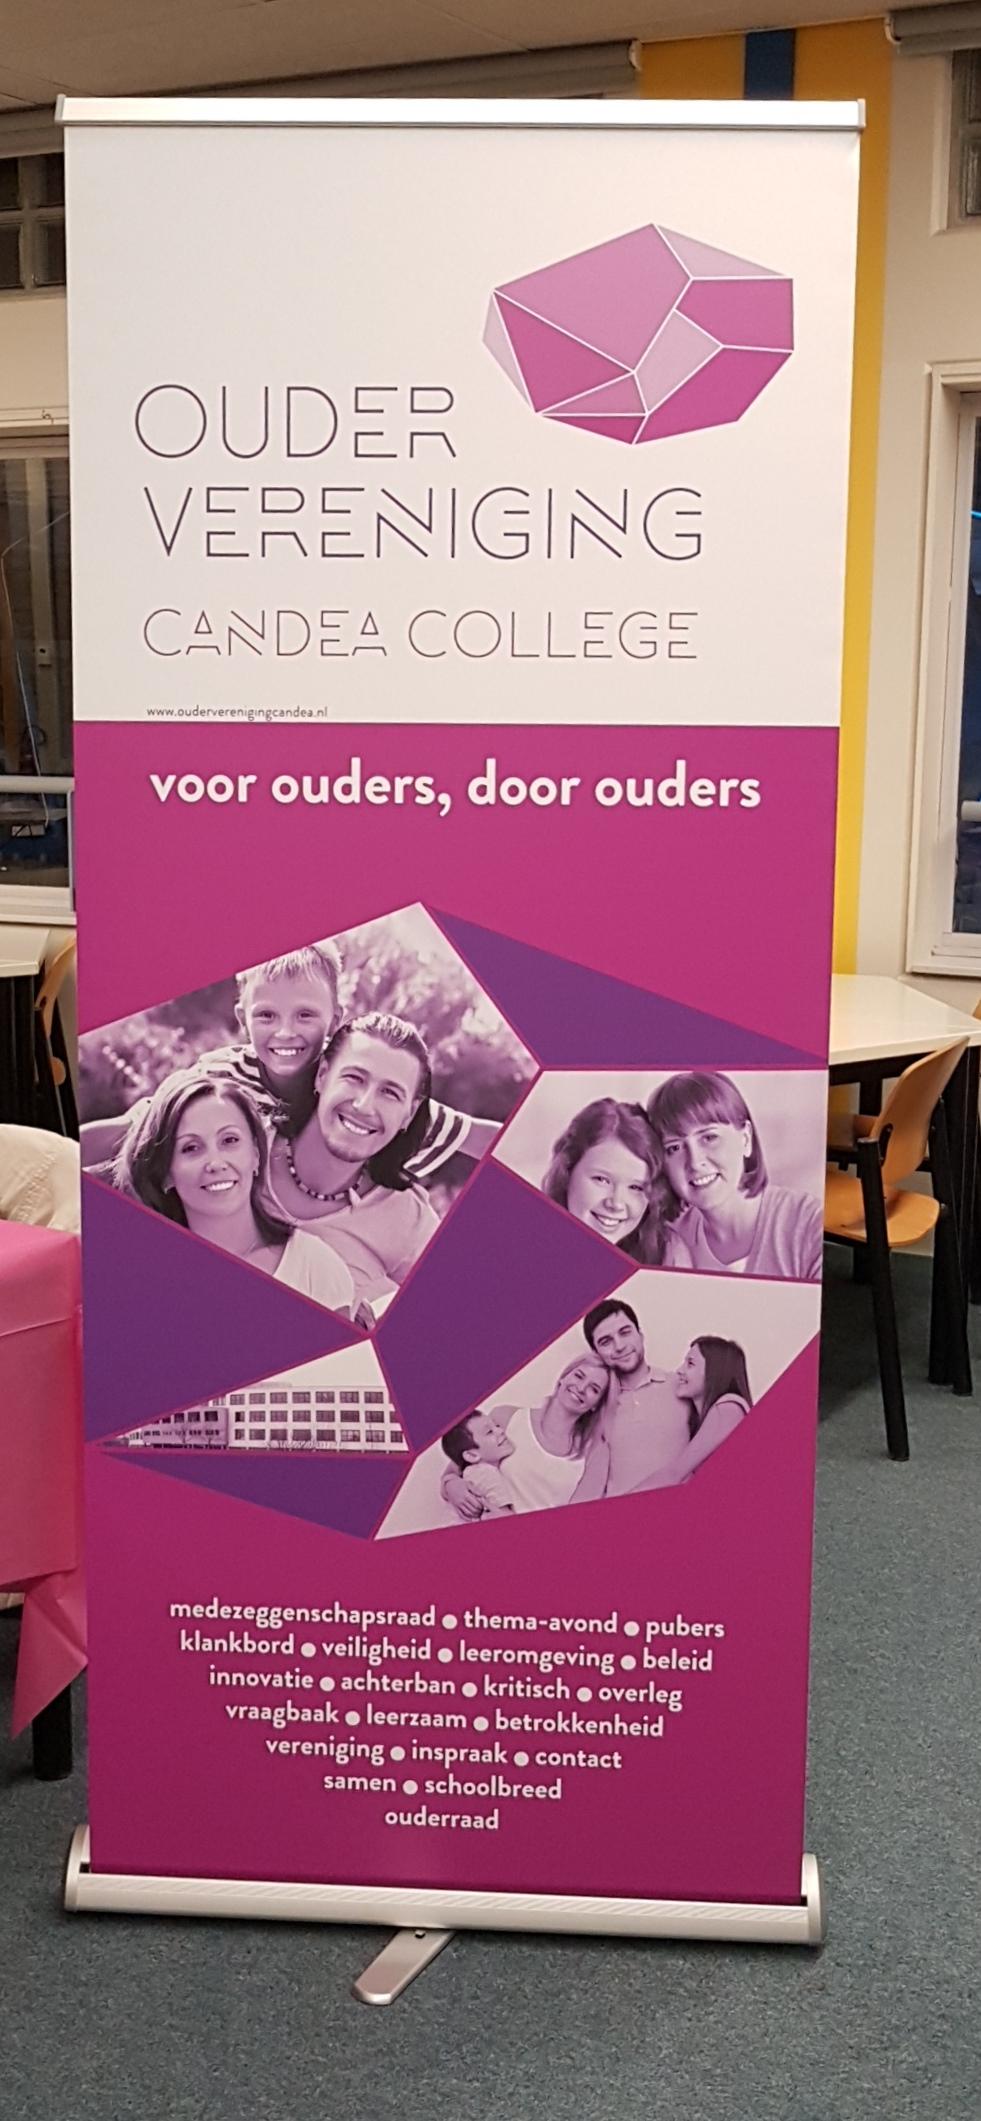 https://presentationmatters.nl/wp-content/uploads/2018/04/banier-als-foto-1.jpg